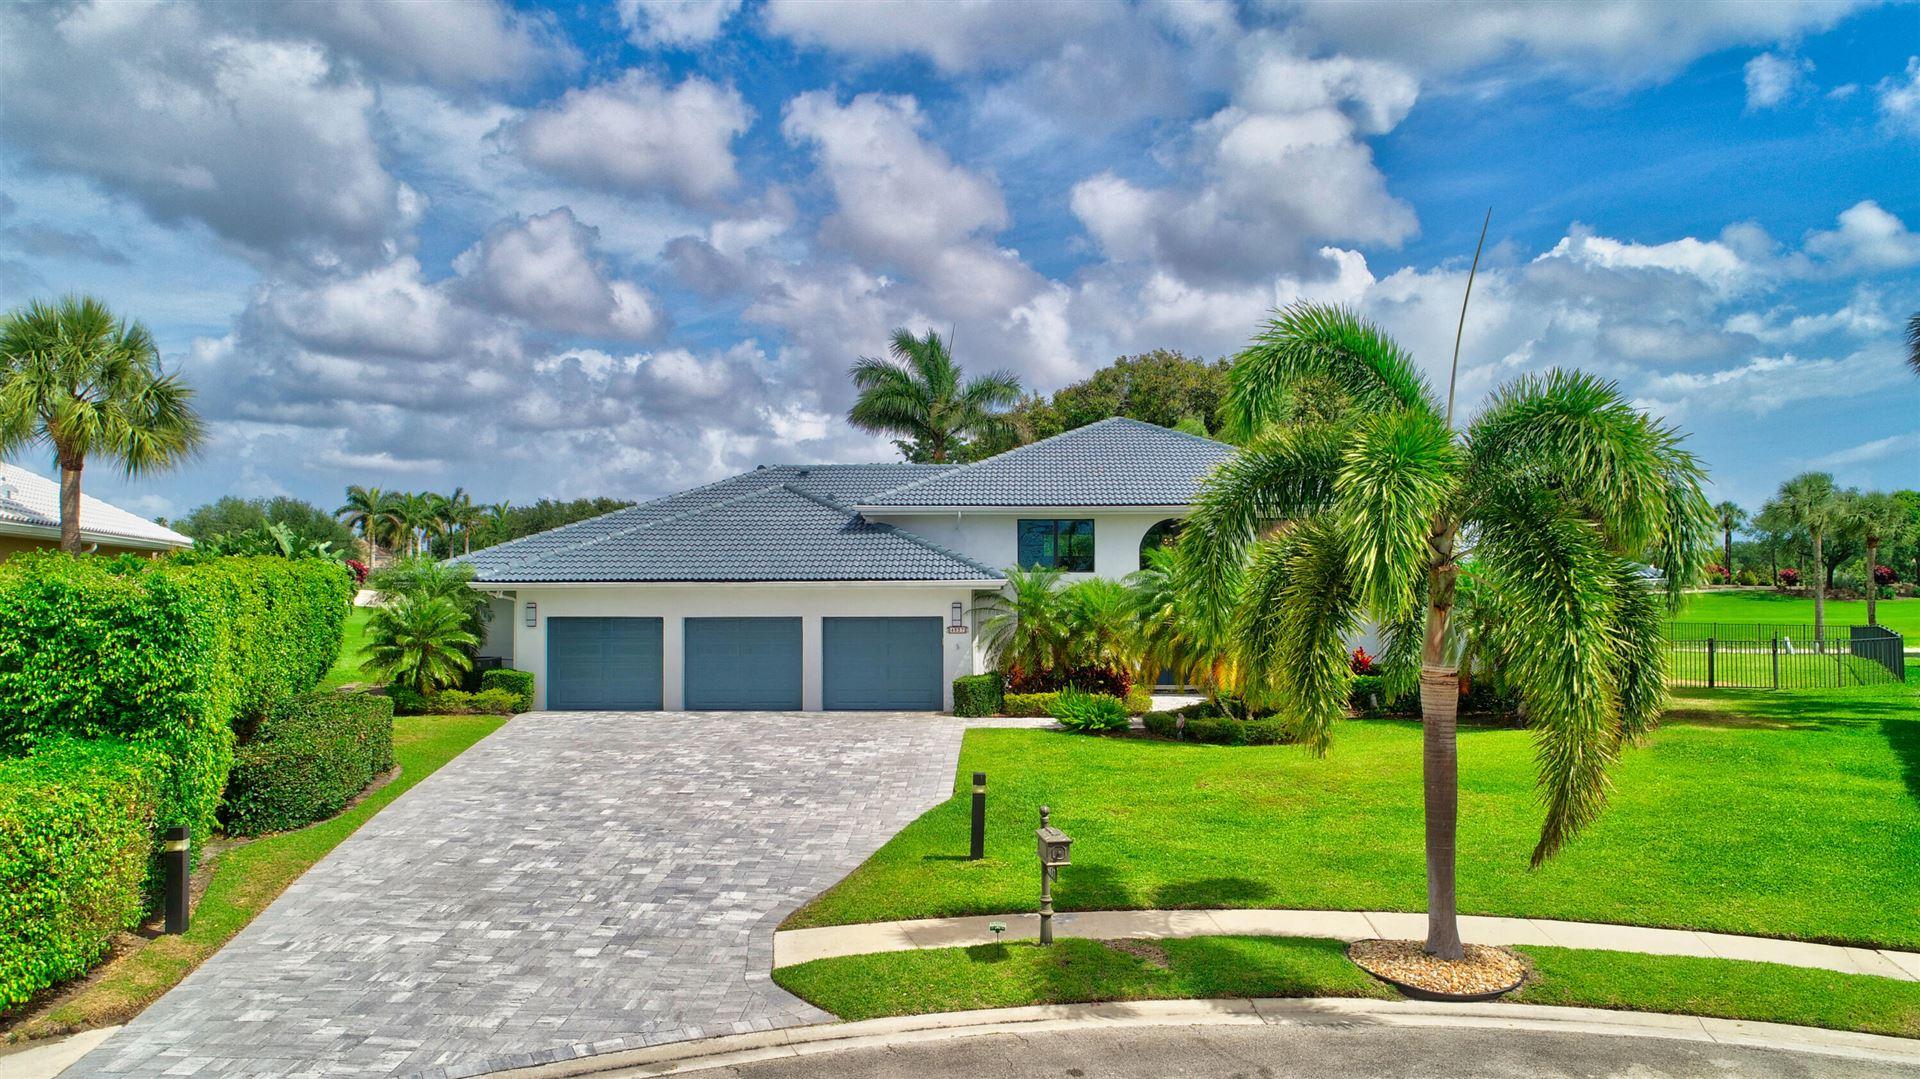 4837 Tallowwood Lane, Boca Raton, FL 33487 - #: RX-10753700